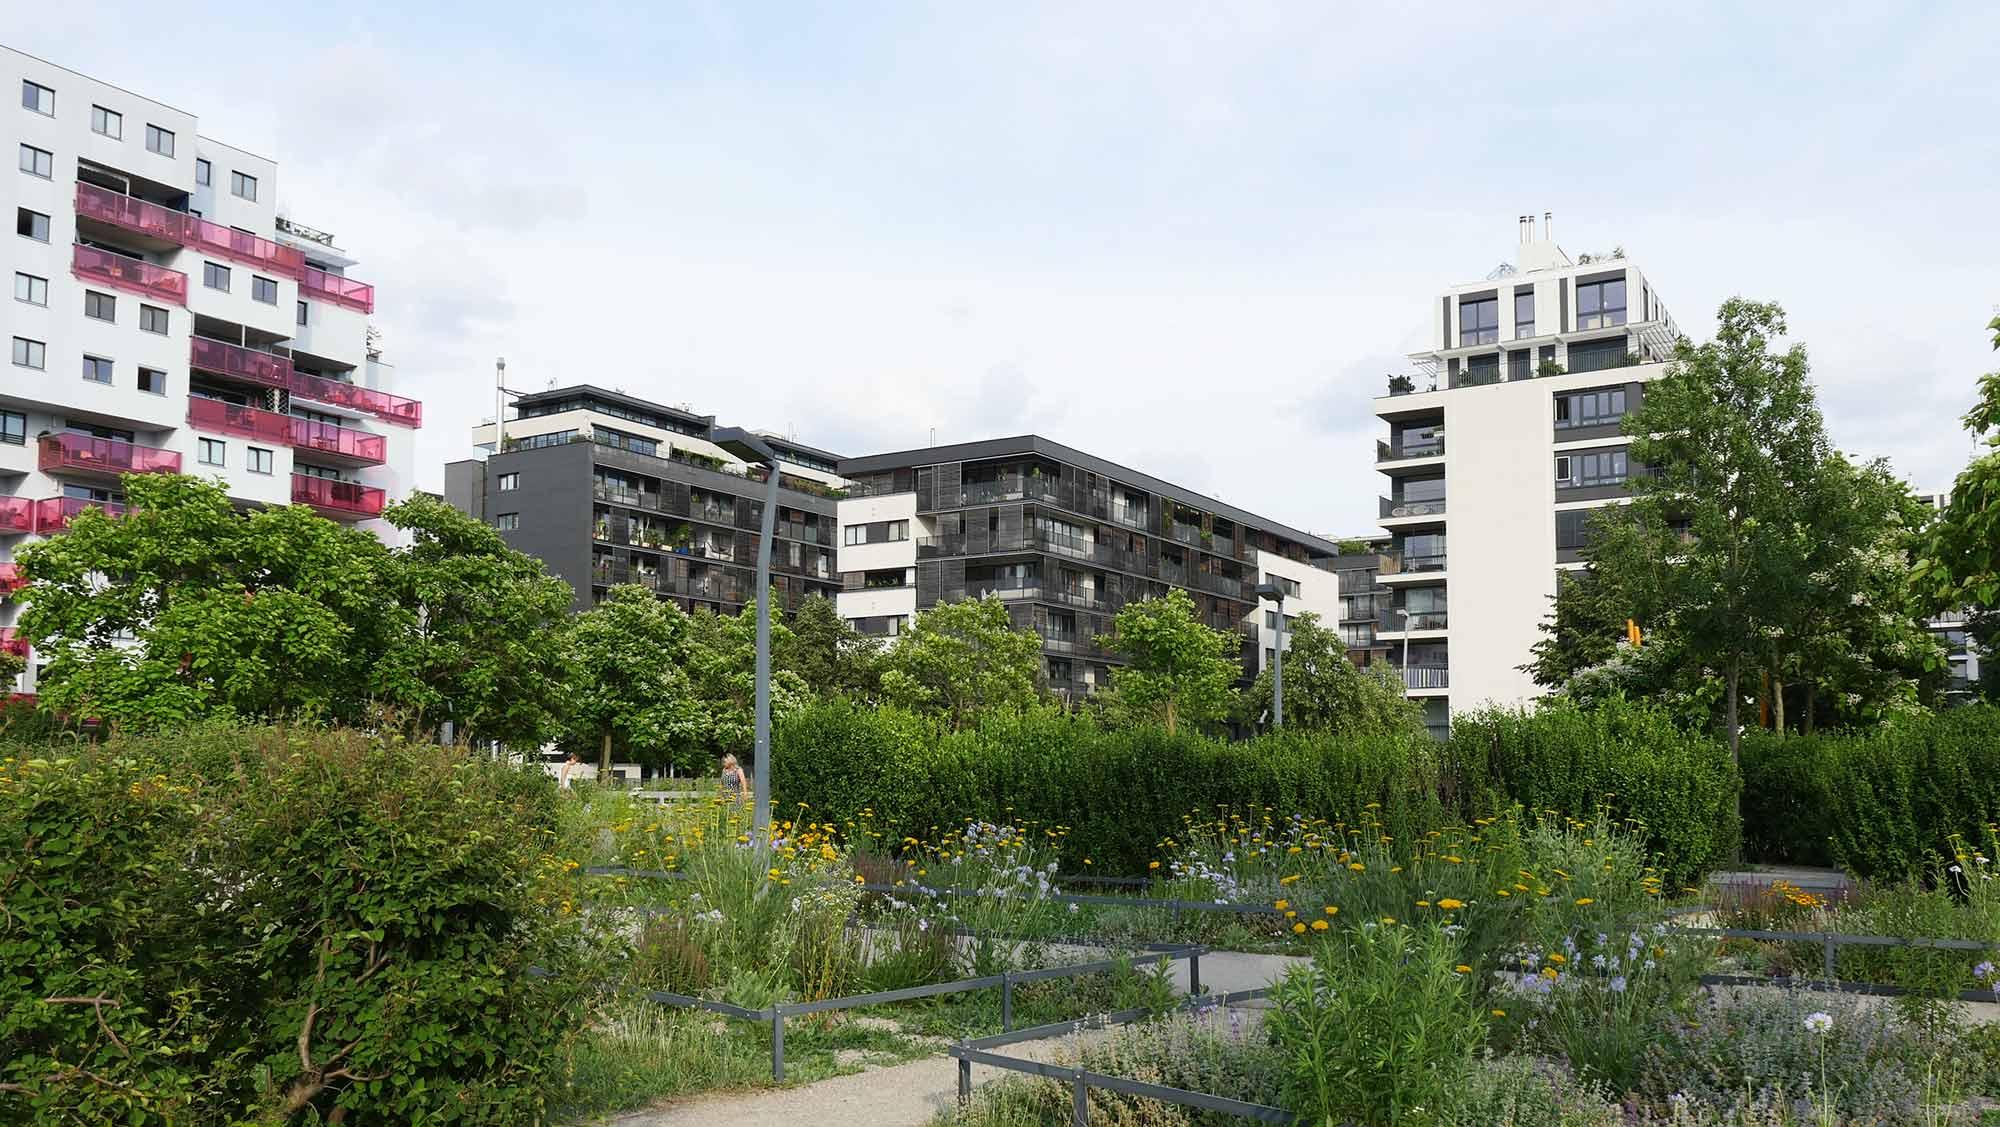 Wiener Stadtquartier